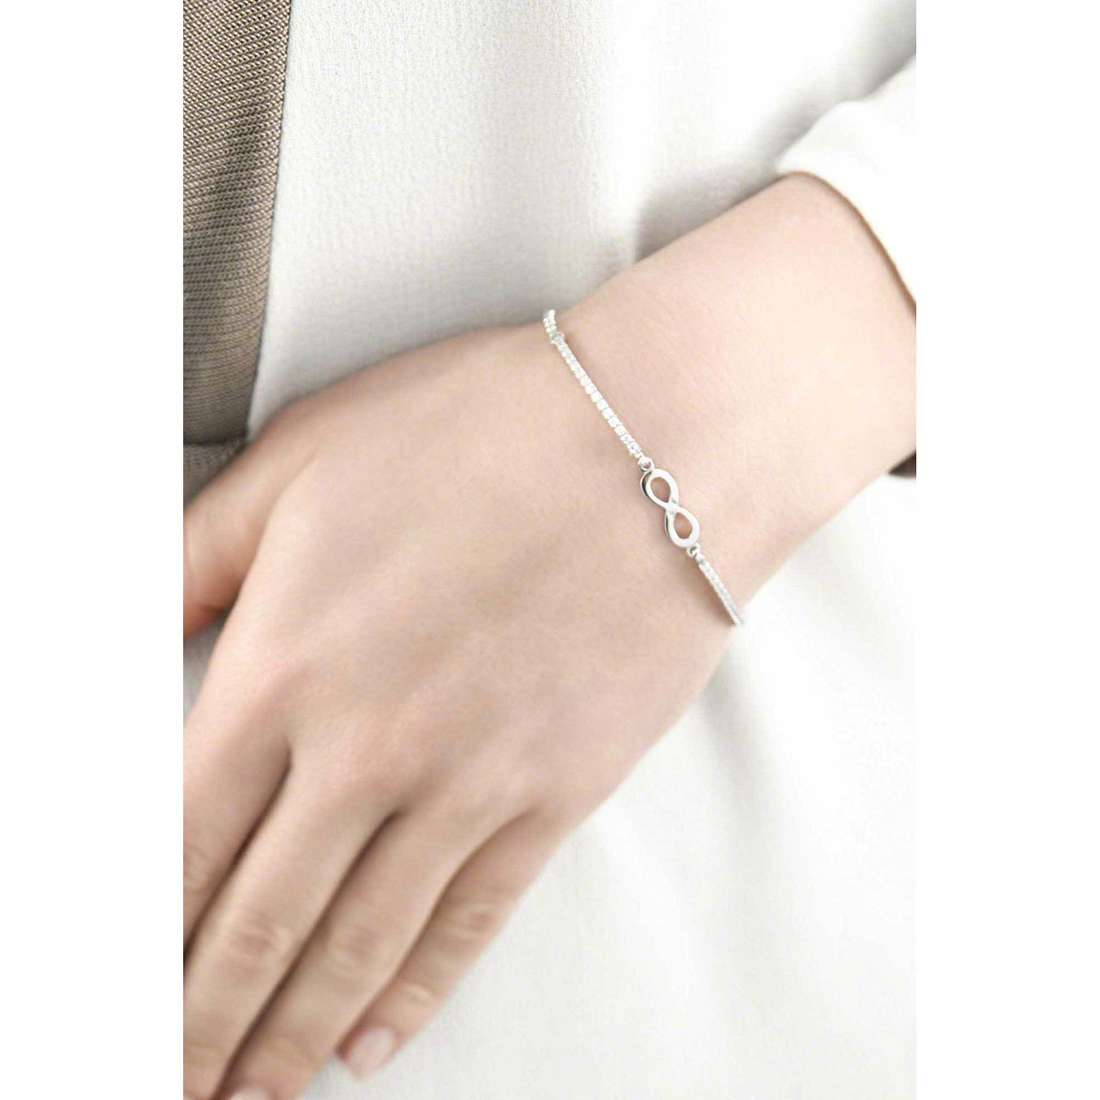 Jack&co bracelets Dream femme JCB0686 indosso